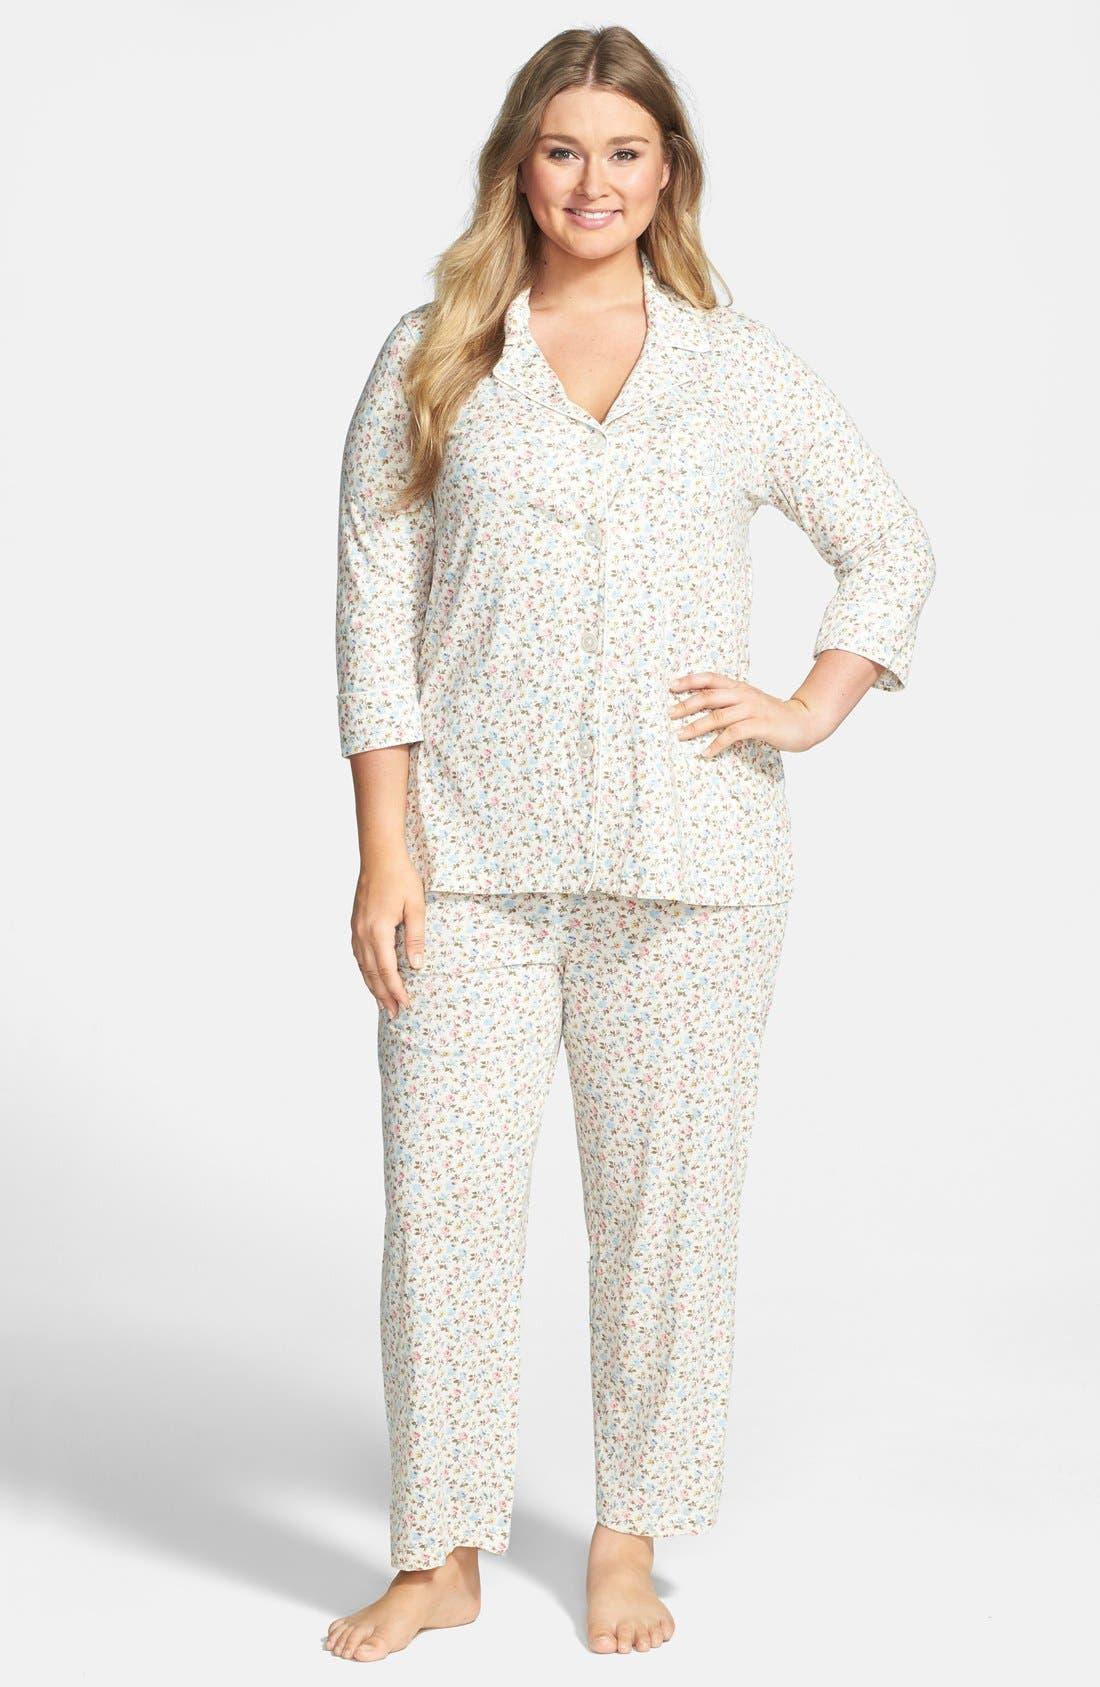 Alternate Image 1 Selected - Lauren Ralph Lauren Jersey Knit Pajamas (Plus Size)